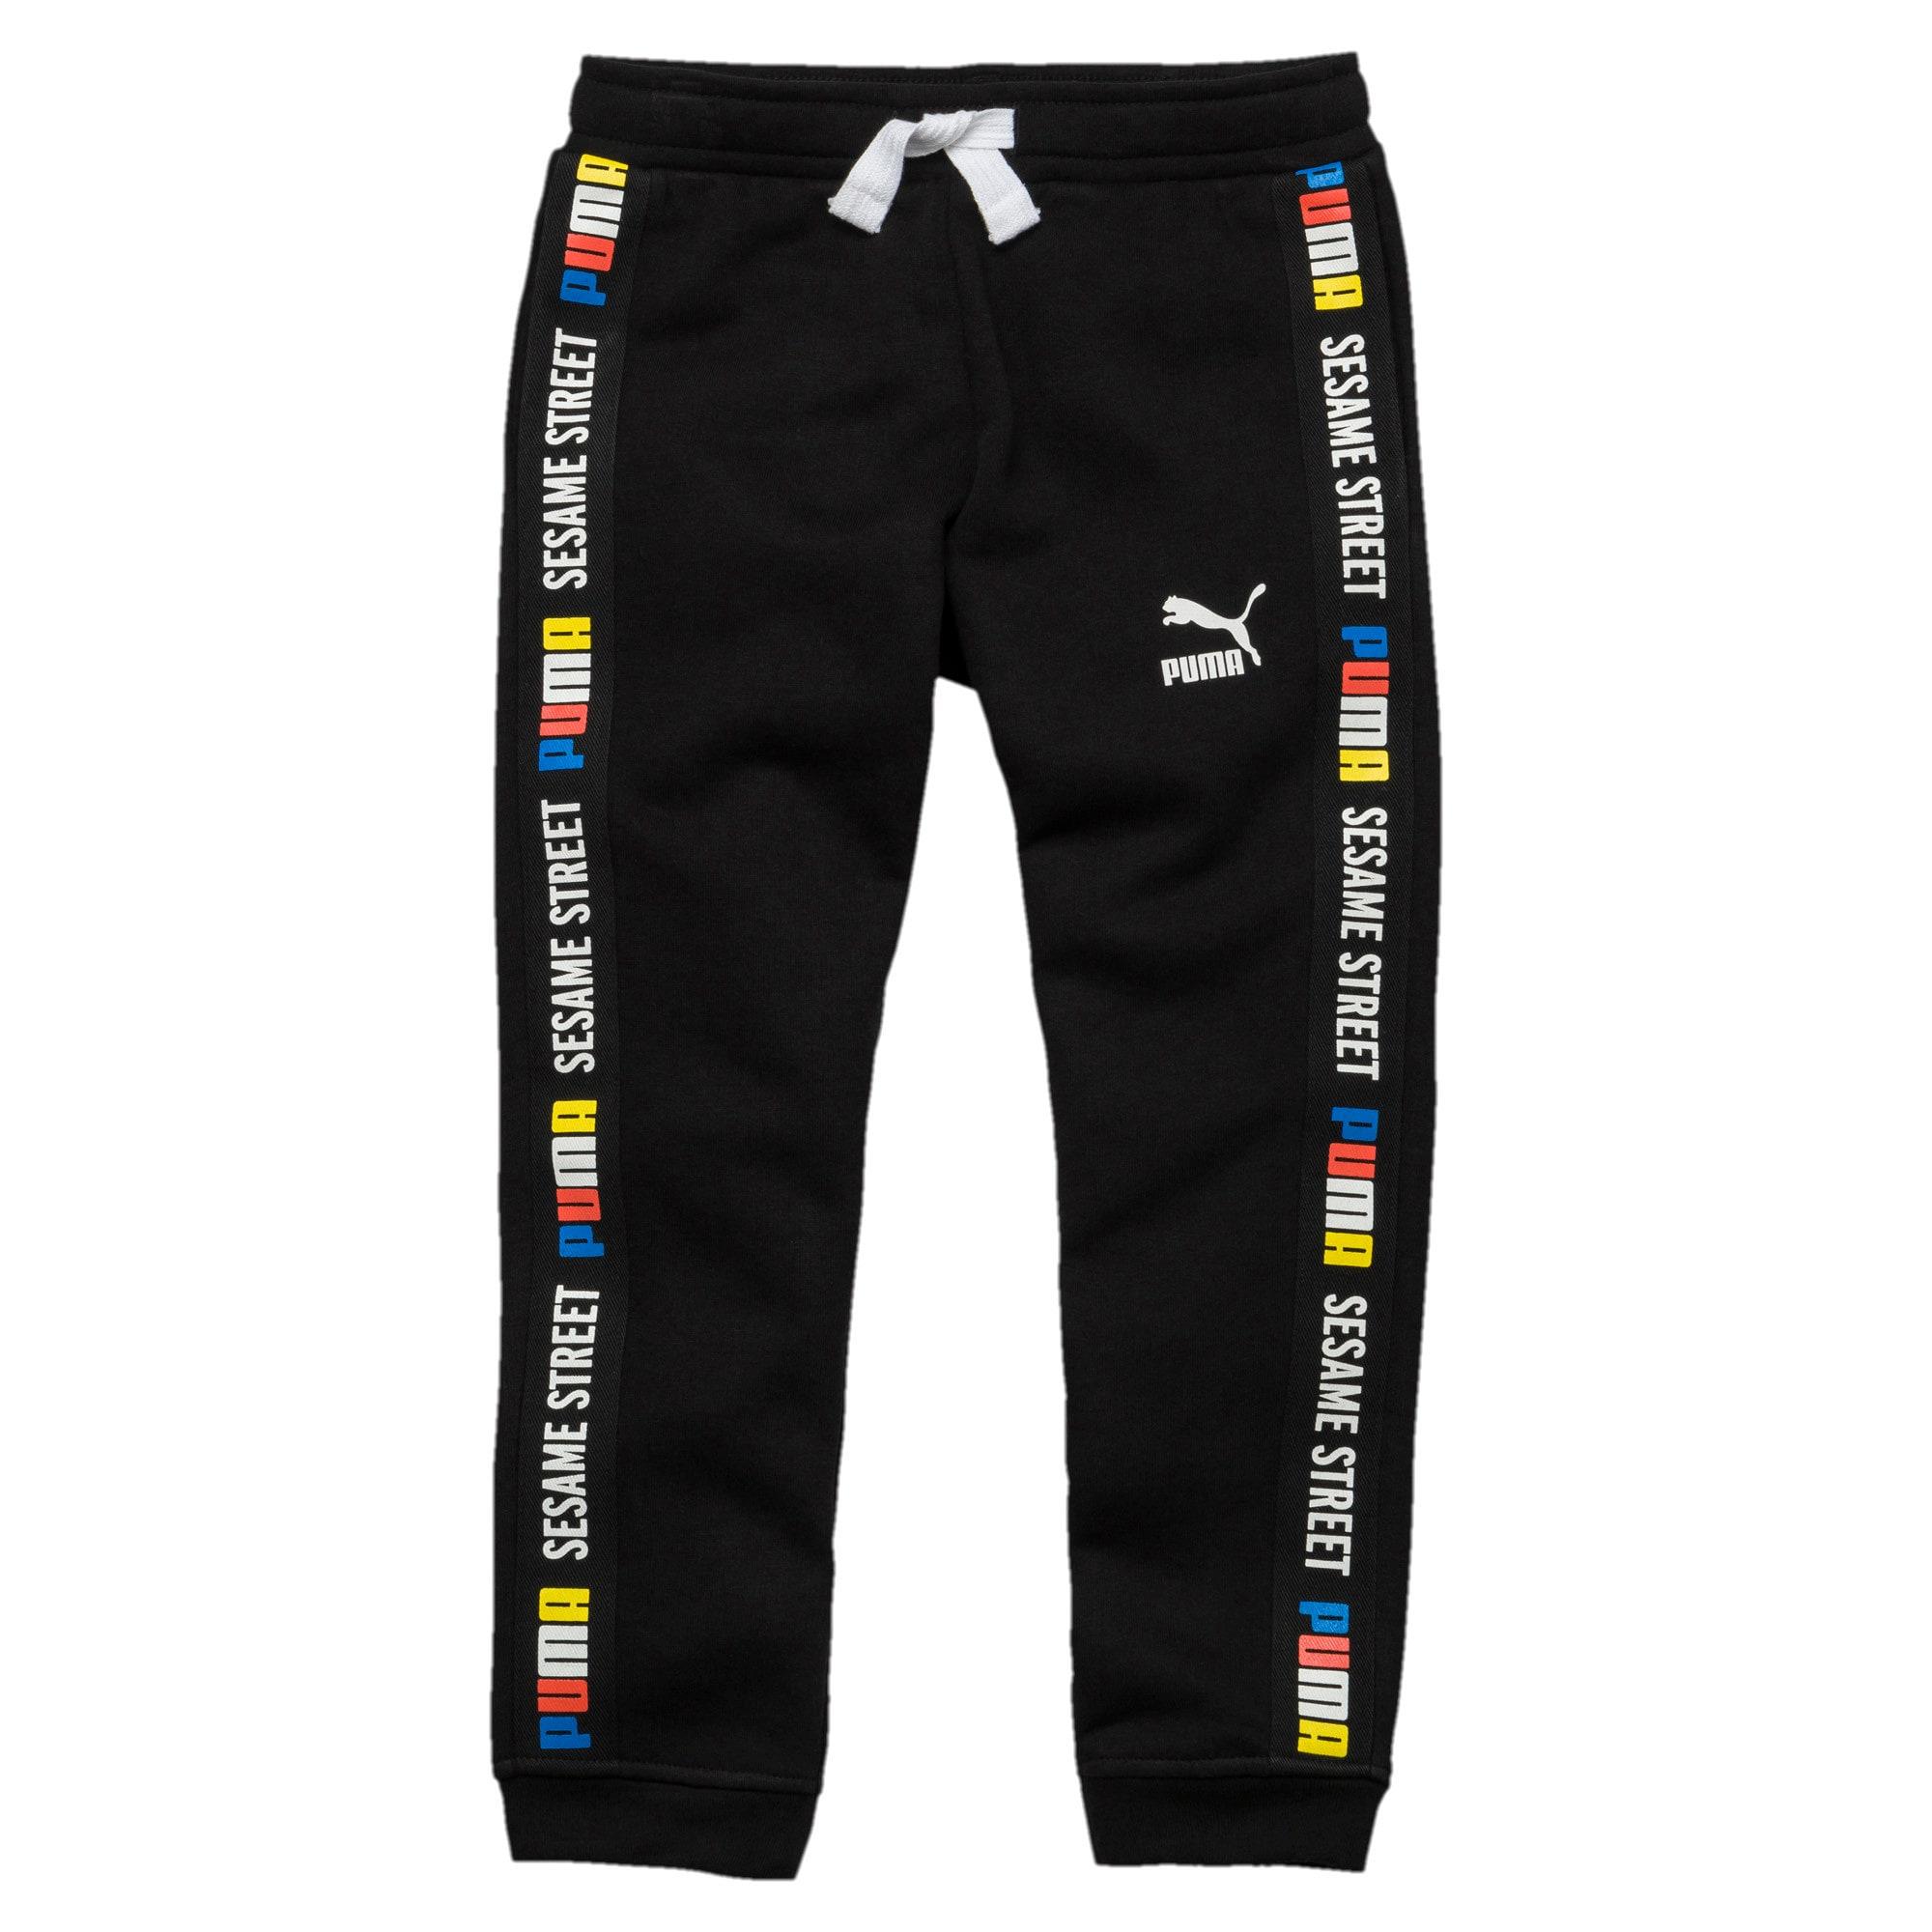 Thumbnail 1 of Sesame Street Knitted Boys' Pants, Cotton Black, medium